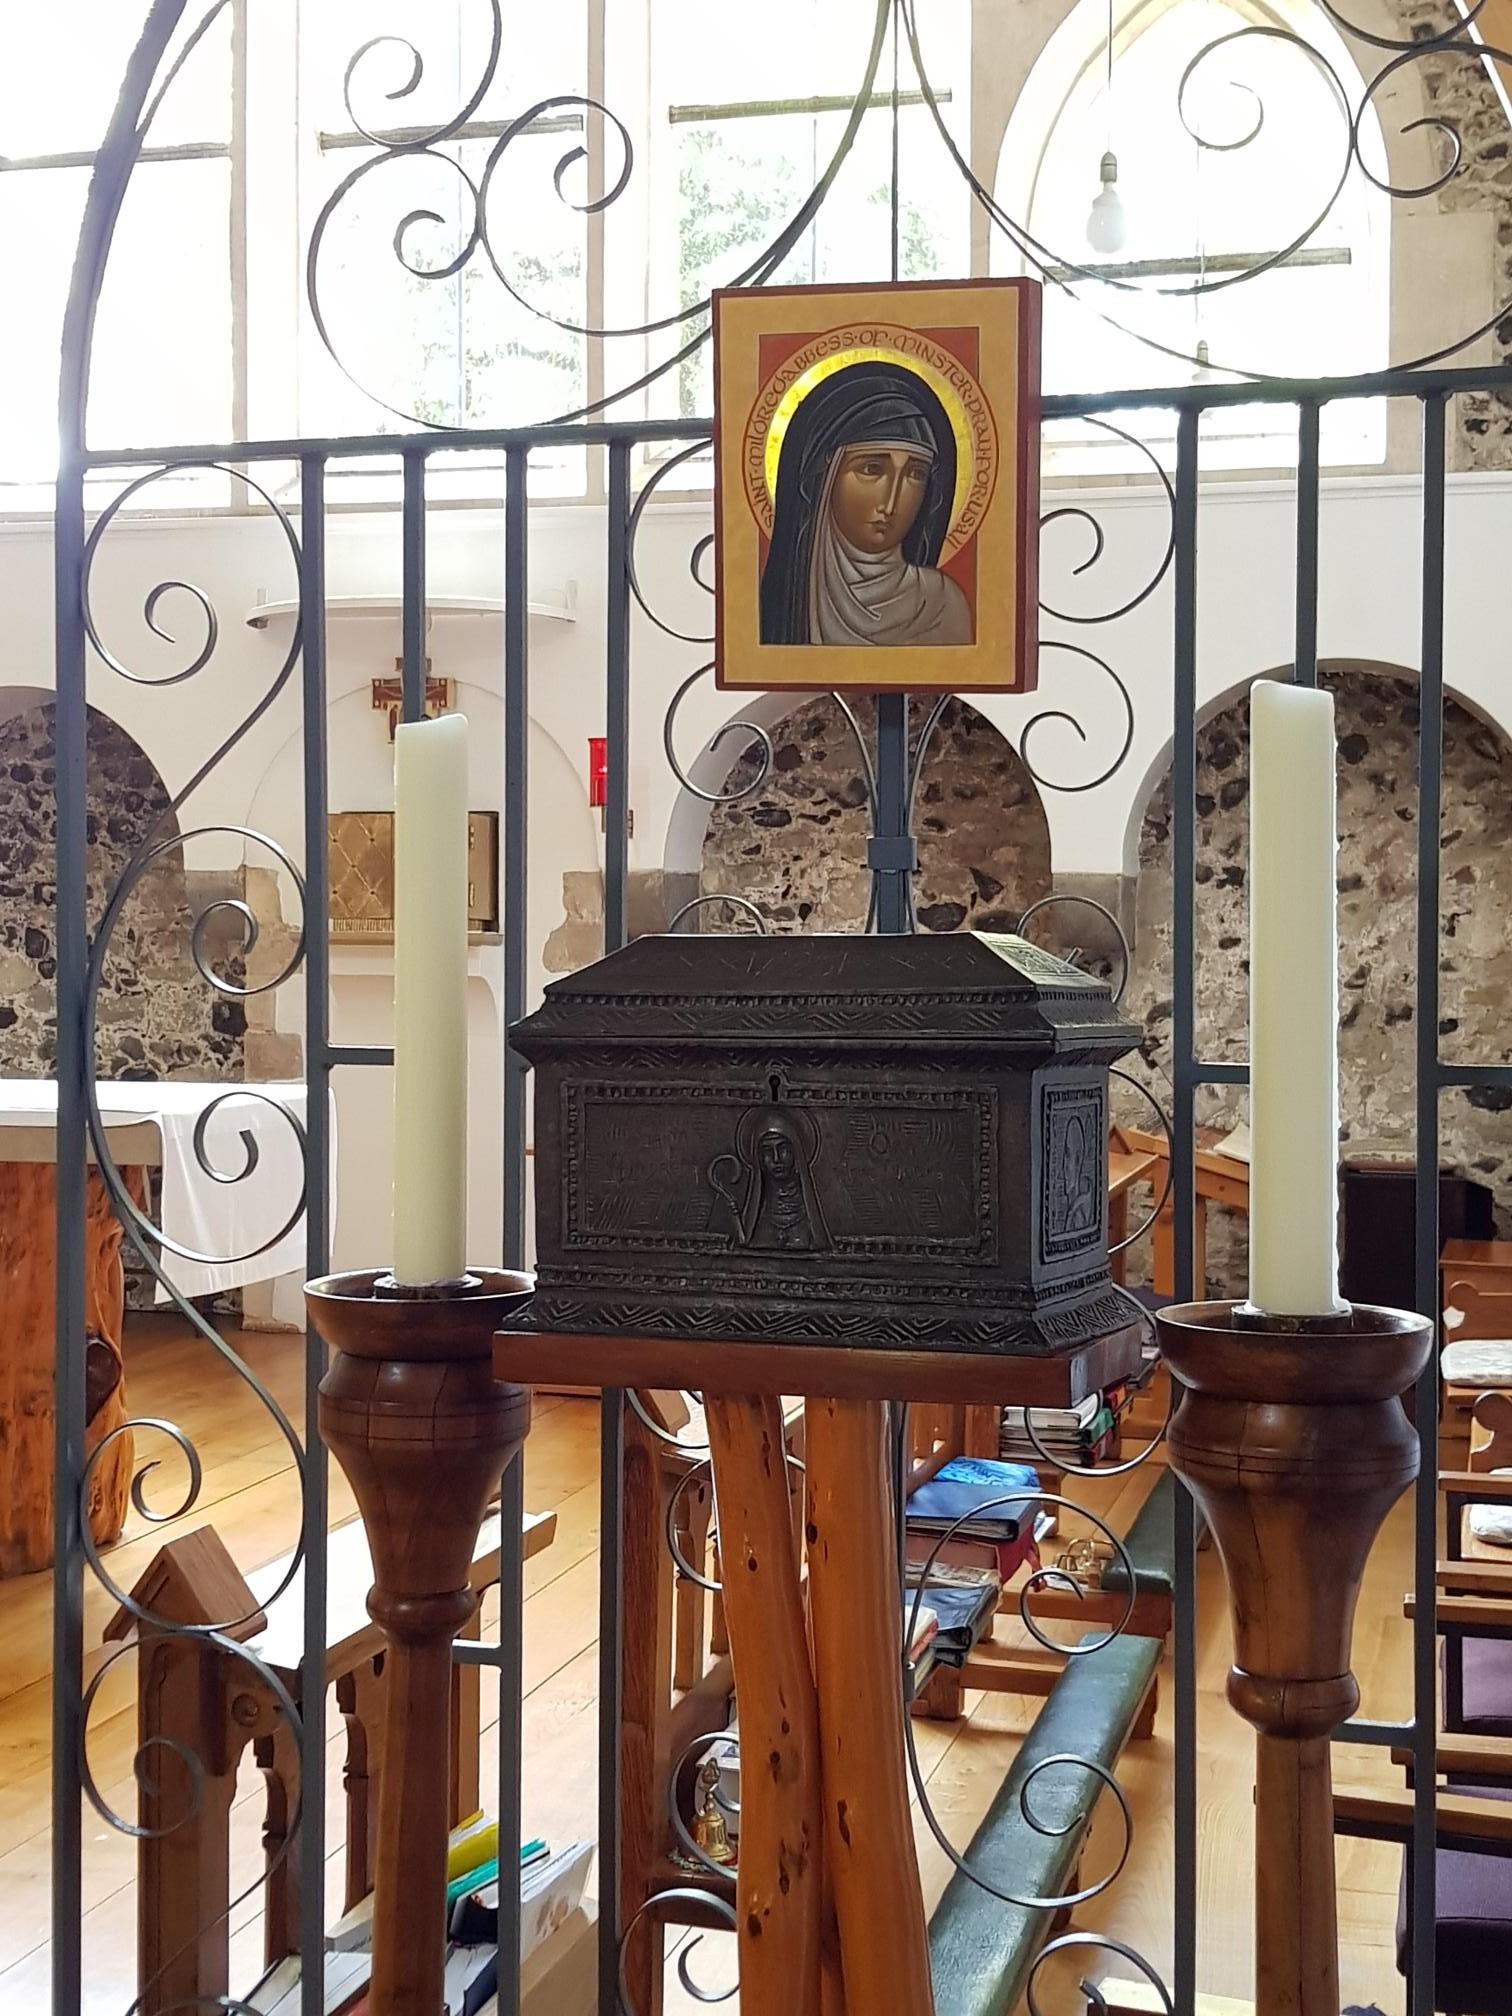 Shrine of St Mildreth